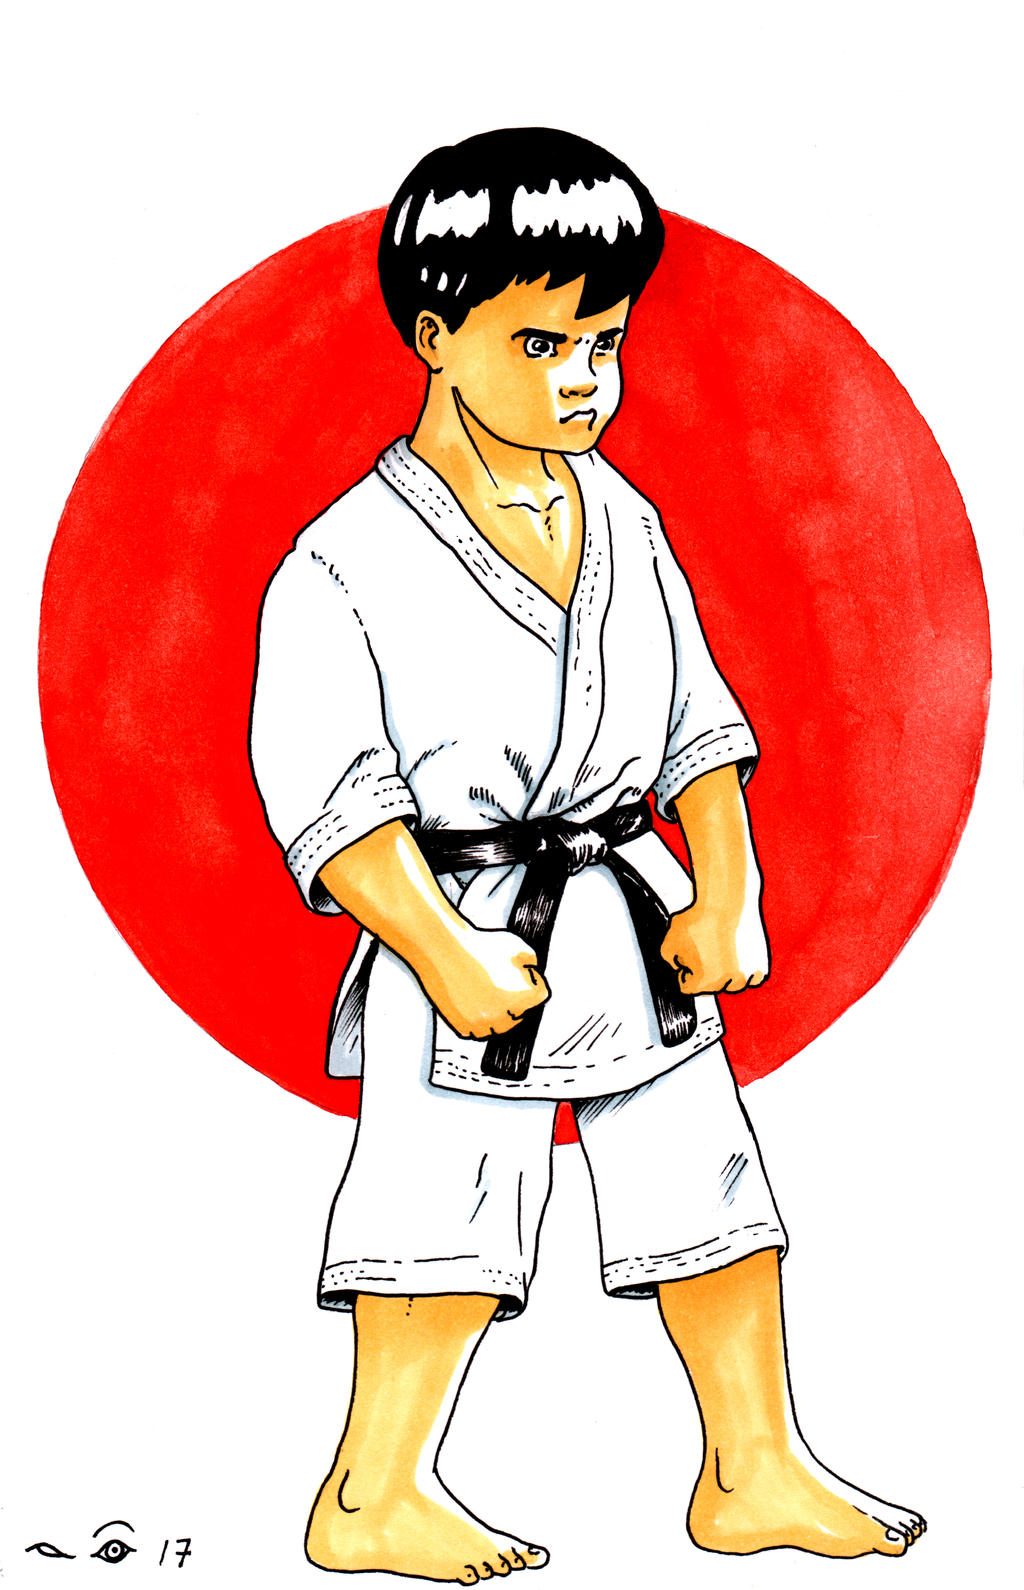 Karate Attitude by emalterre